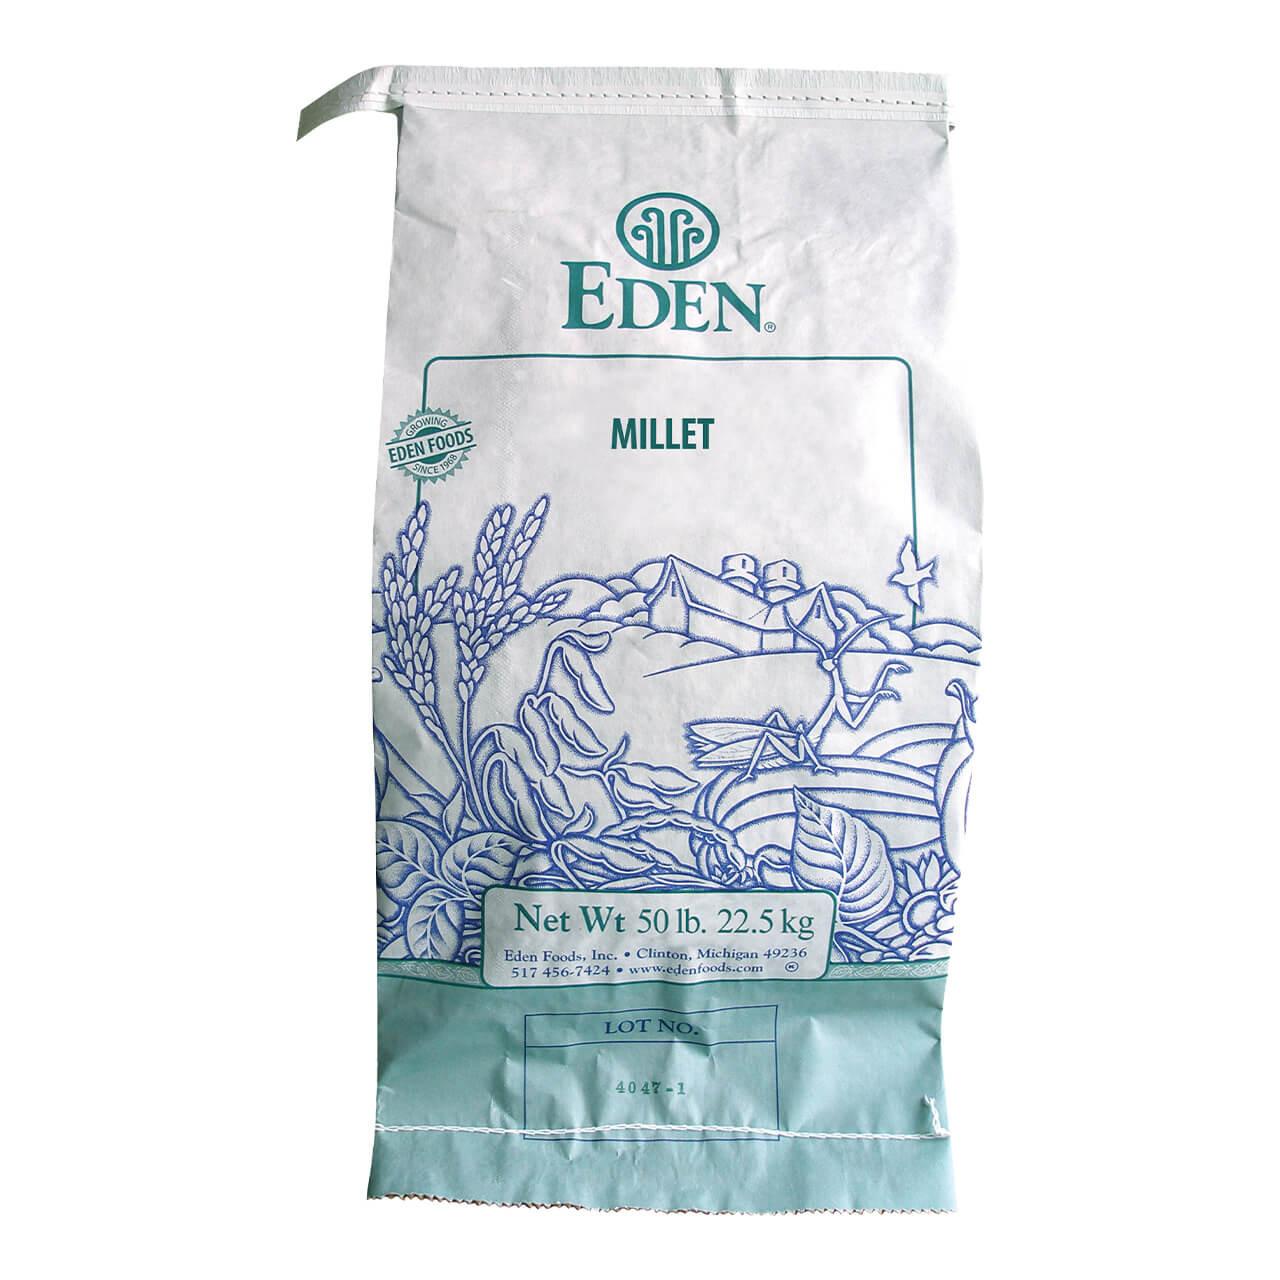 Millet, Organic - 50 lb